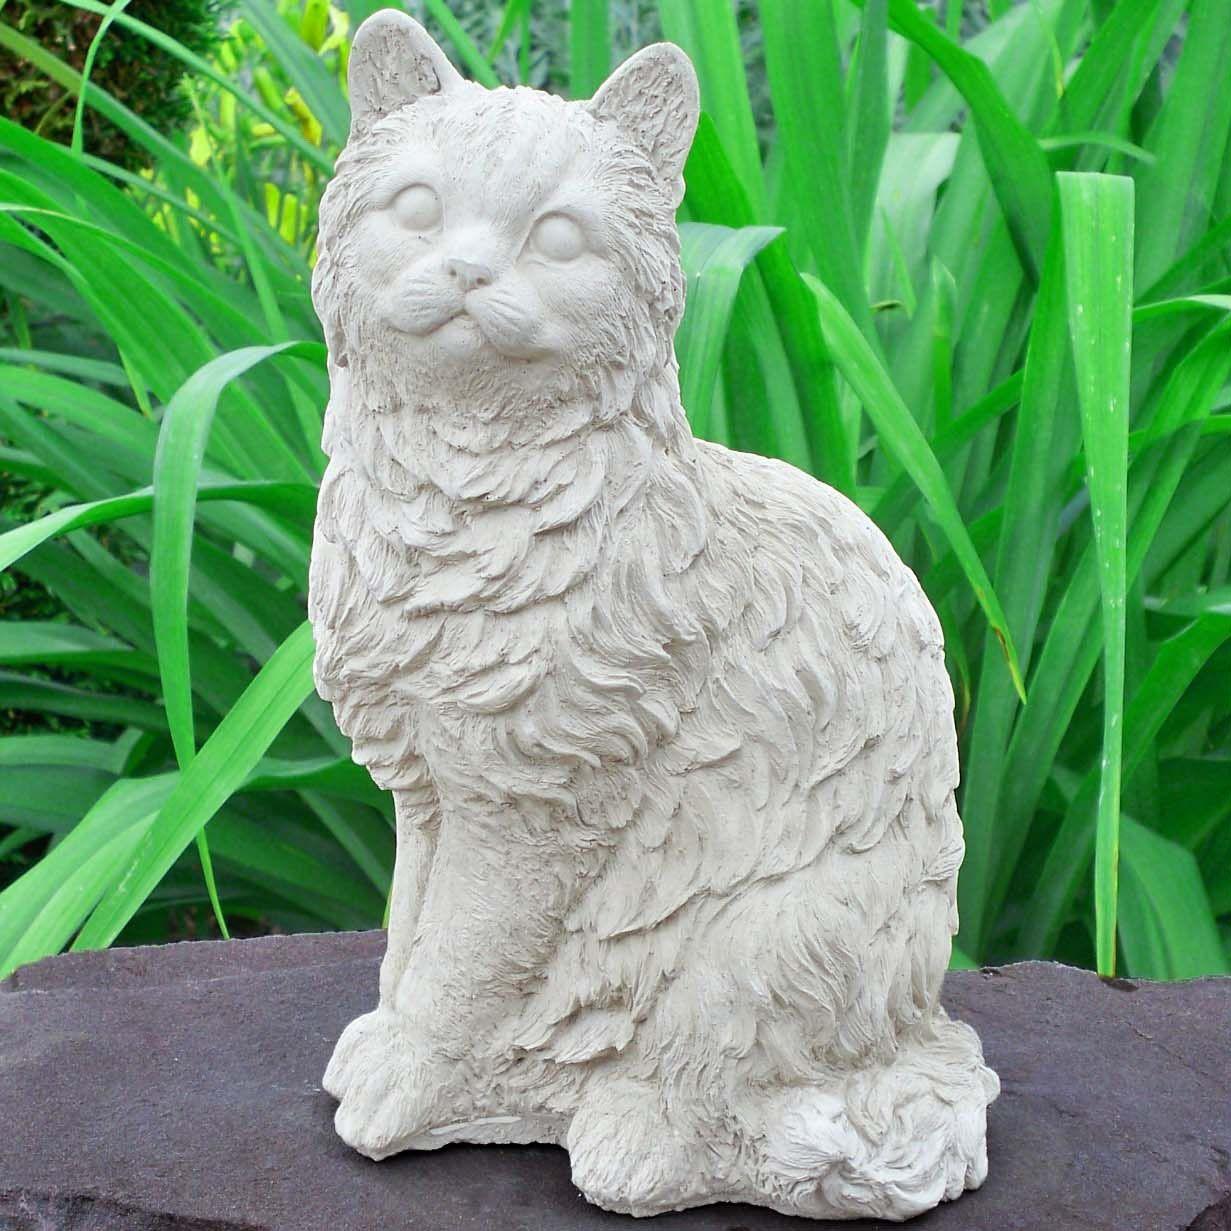 Captivating Pet Memorial Marker Dog U0026 Cat Memorials Pet Headstones Dogs Cats Garden  Statues : Furry Long